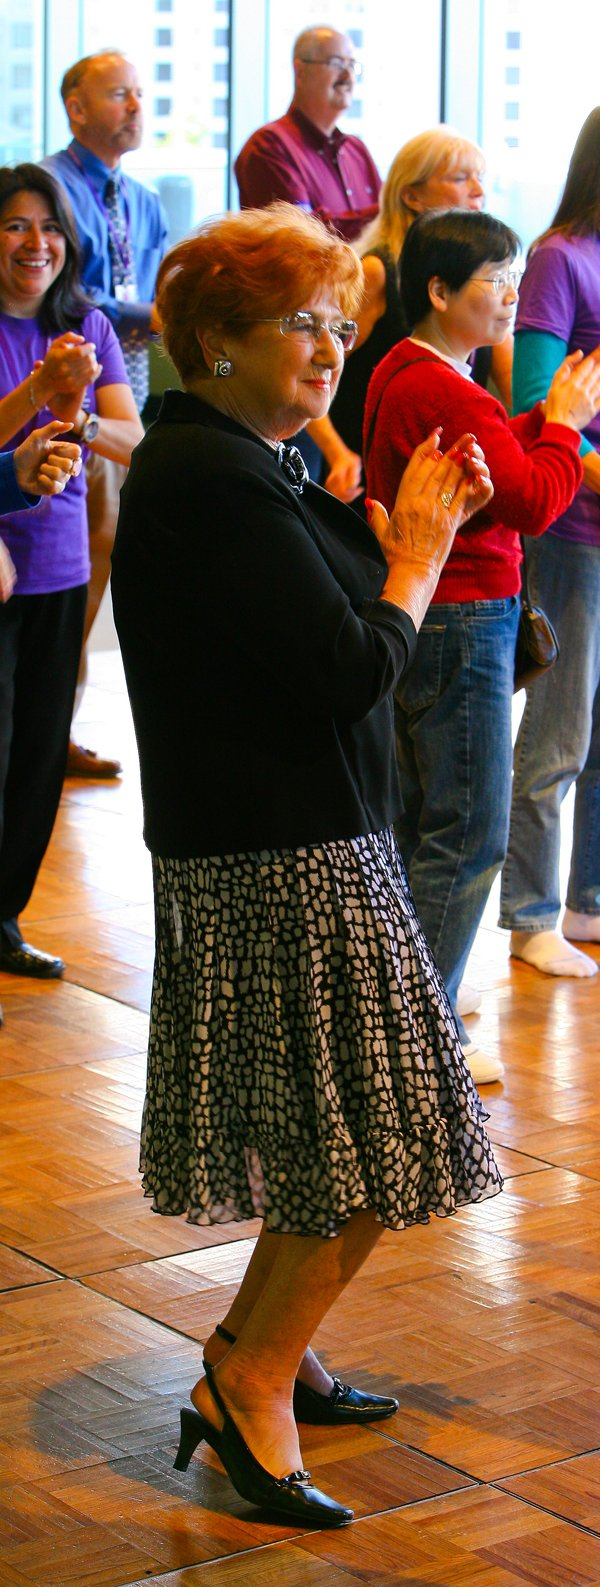 Mom on the dance floor